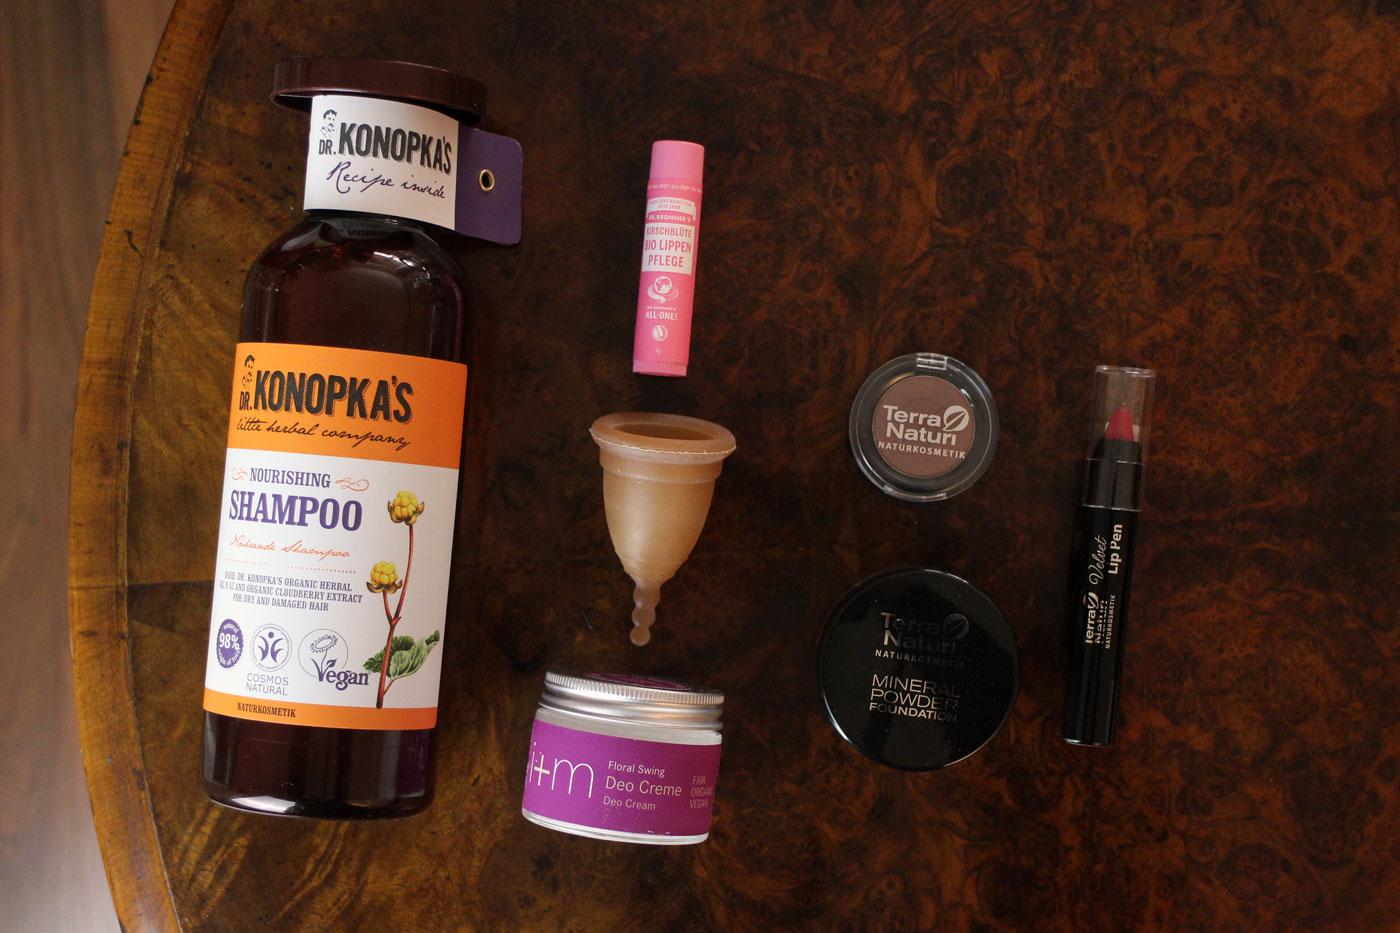 Naturkosmetik aus dem Drogeriemarkt